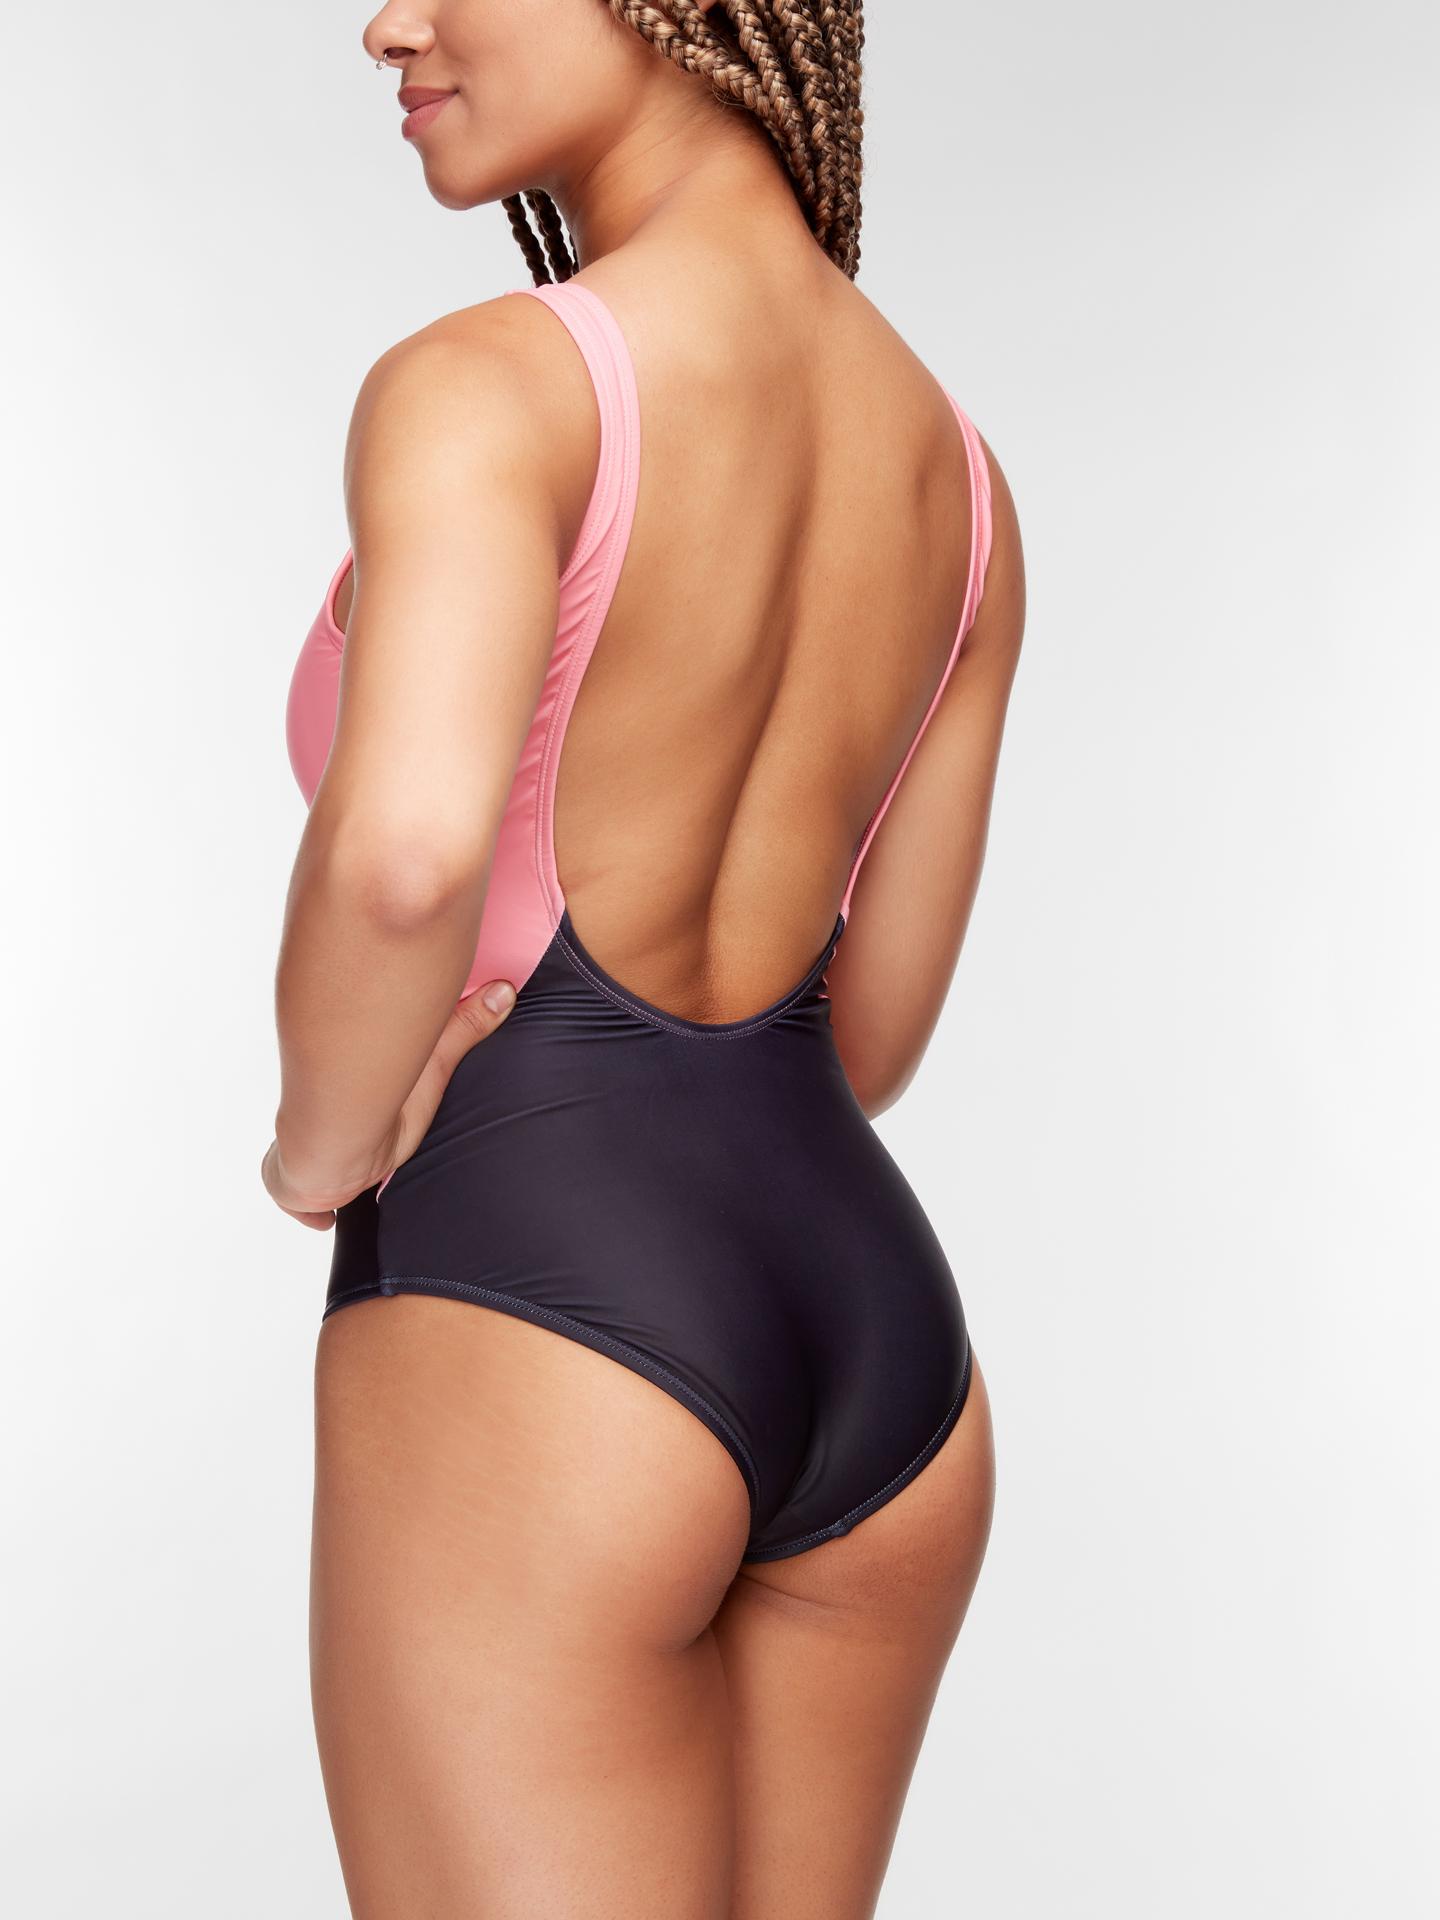 Pre dokonalý a originálny outfit Women's One-piece Swimsuit Black Kitten